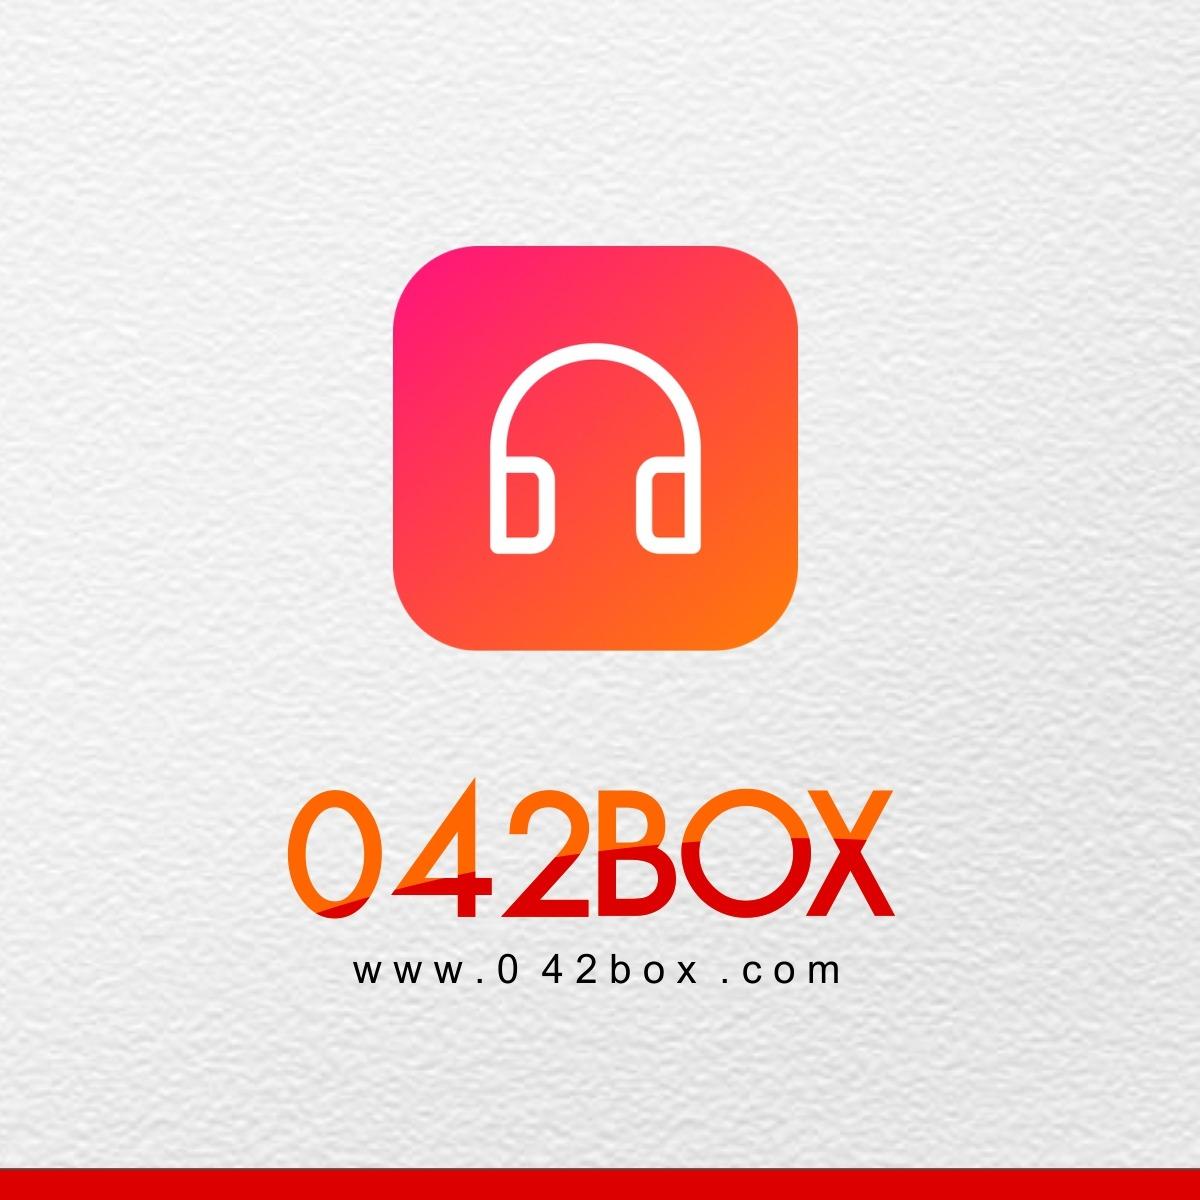 @042box Profile Image | Linktree